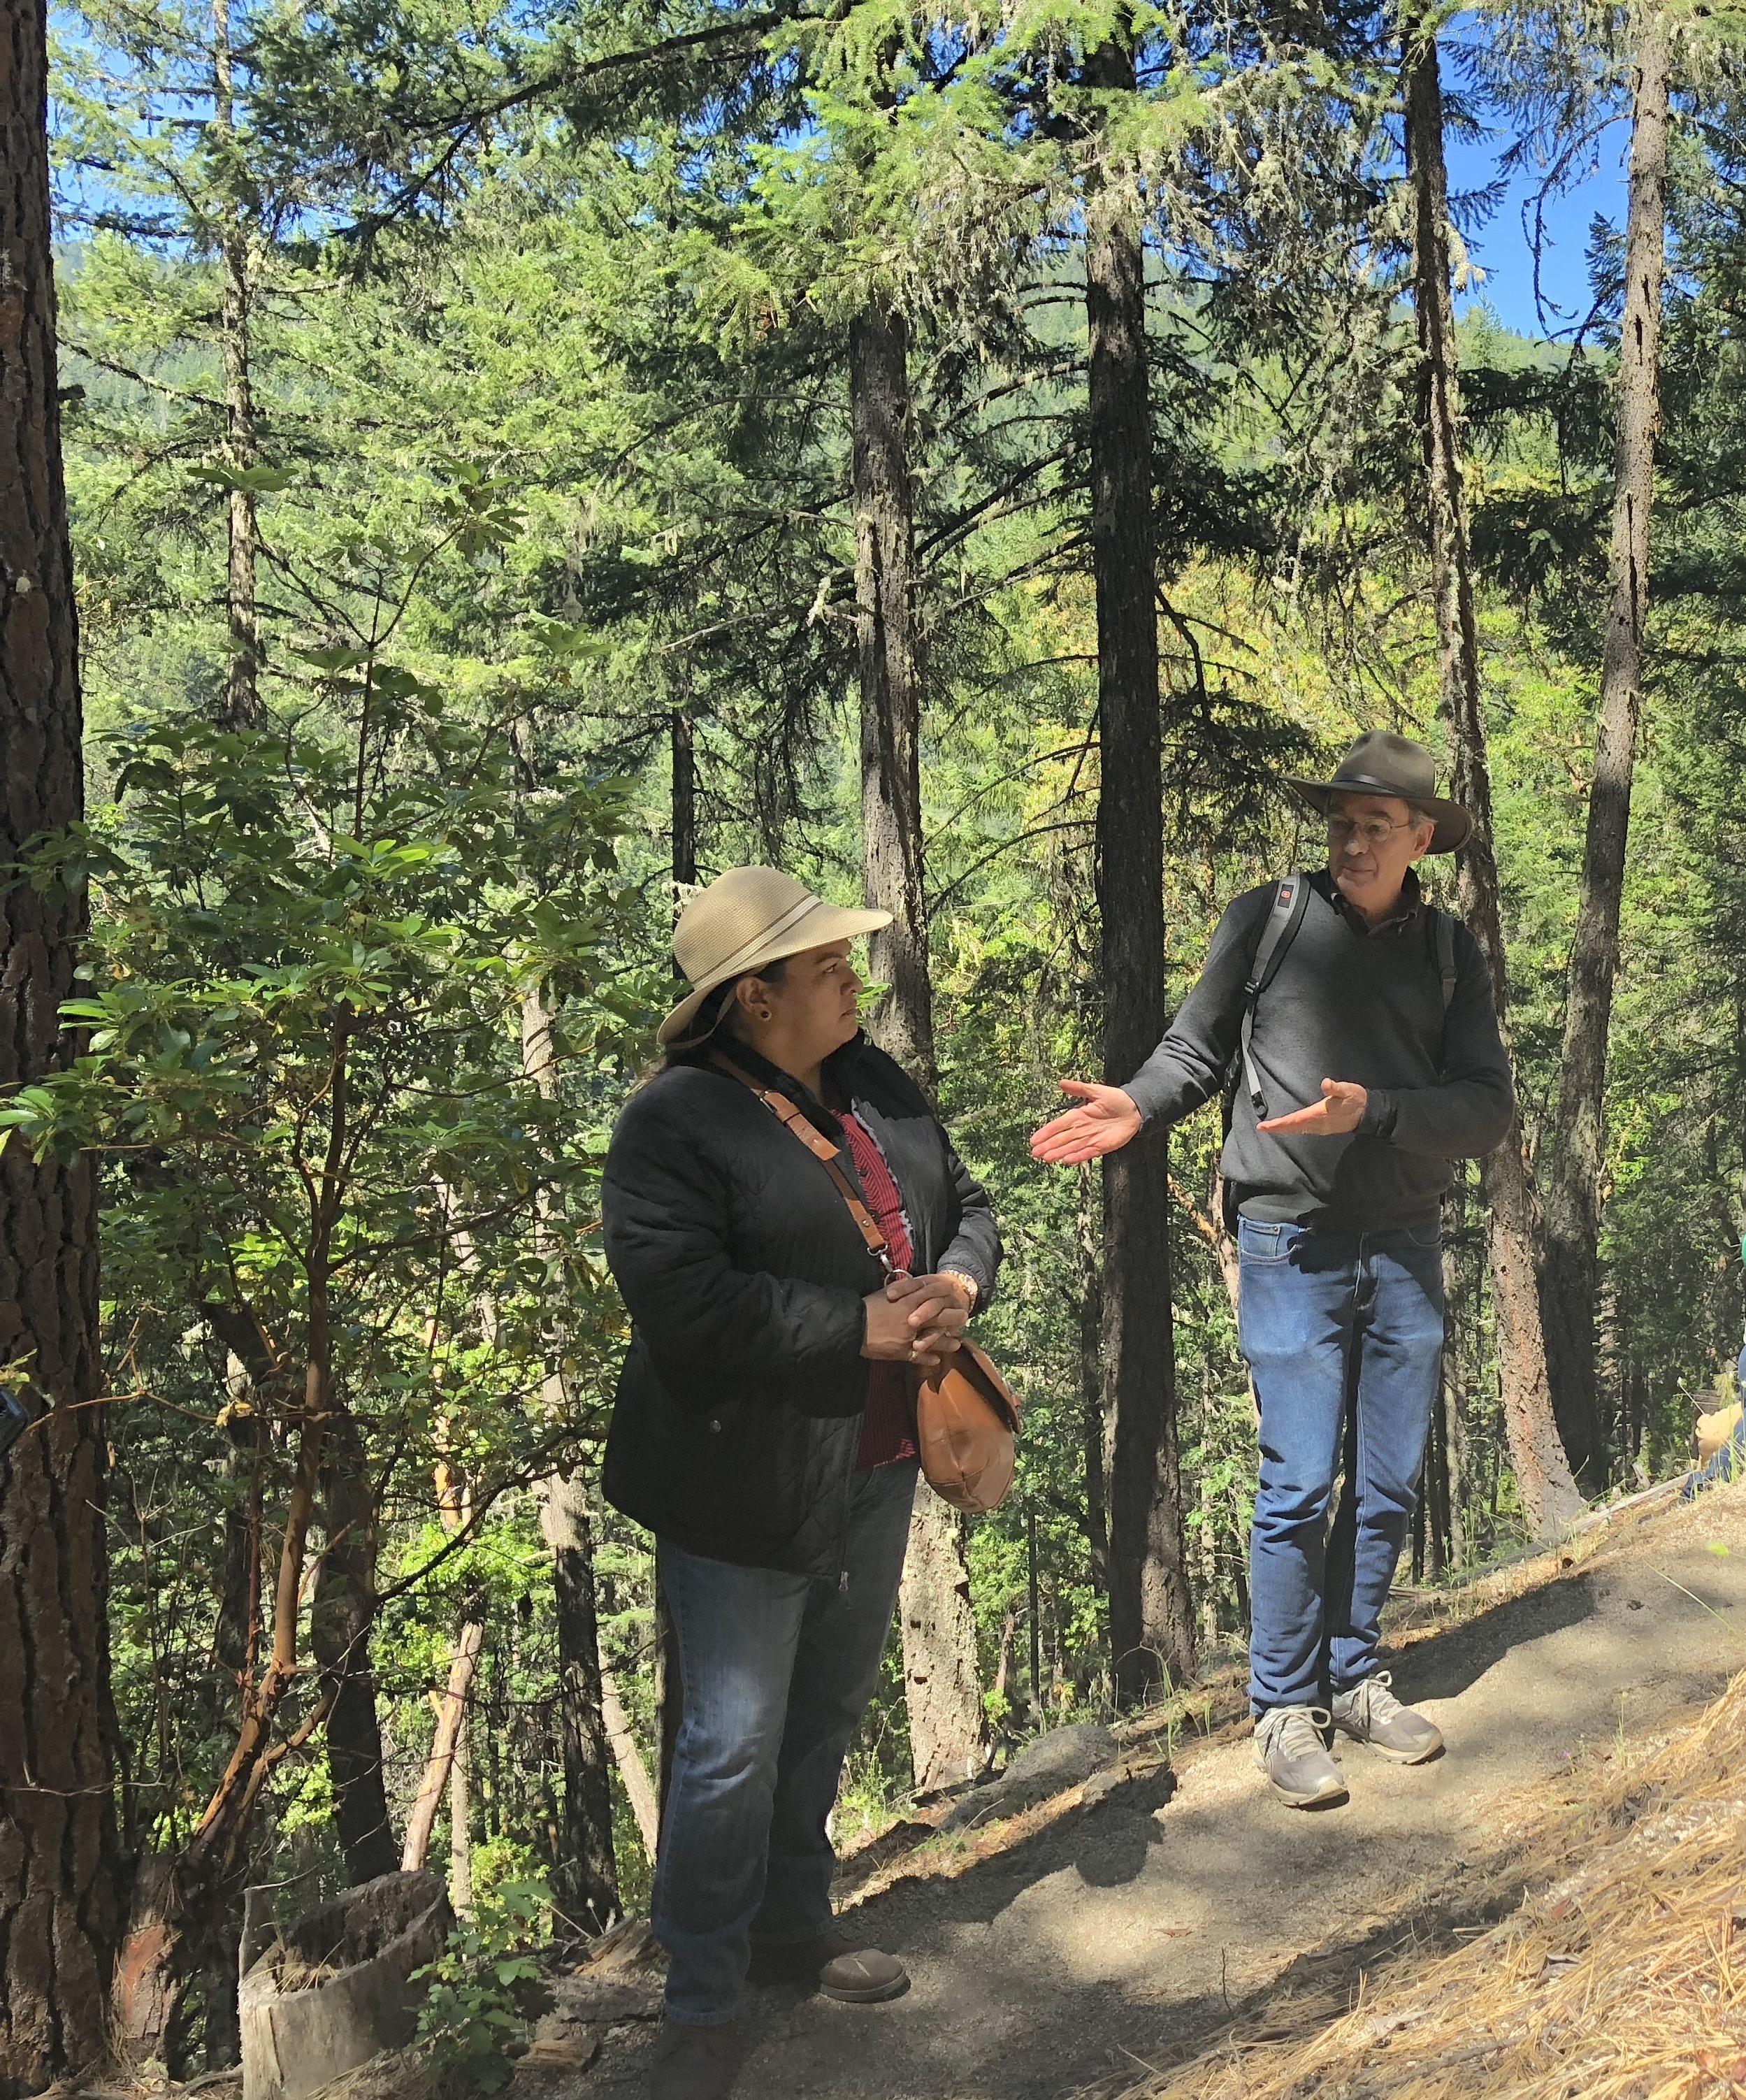 Carl Wilmsen and Martha Valle Hernandez from Northwest Forest Workers Center